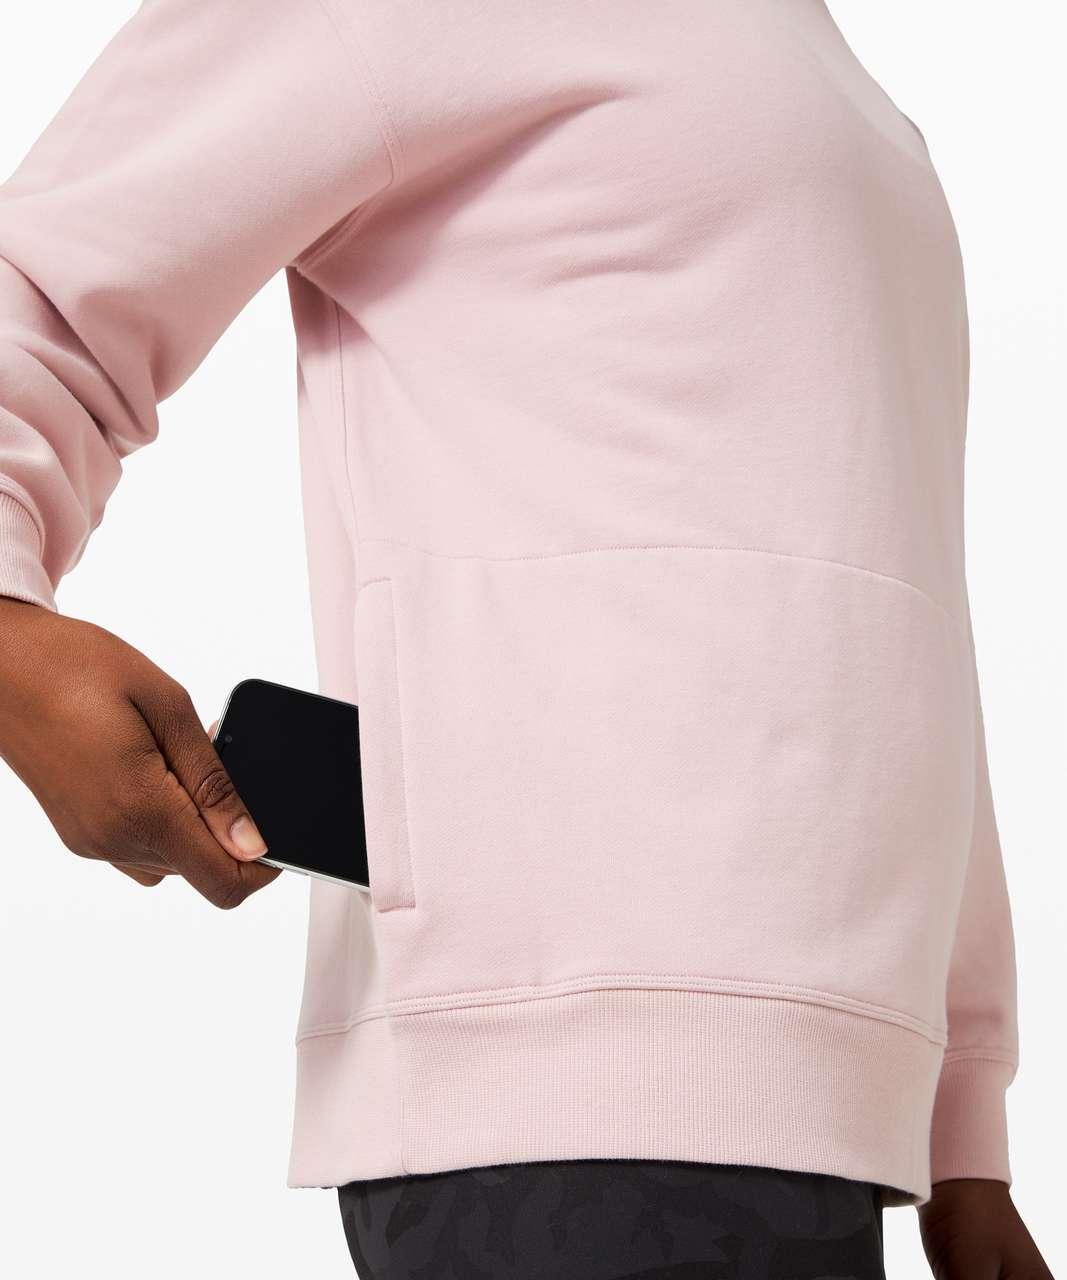 Lululemon Perfectly Oversized Hoodie - Porcelain Pink